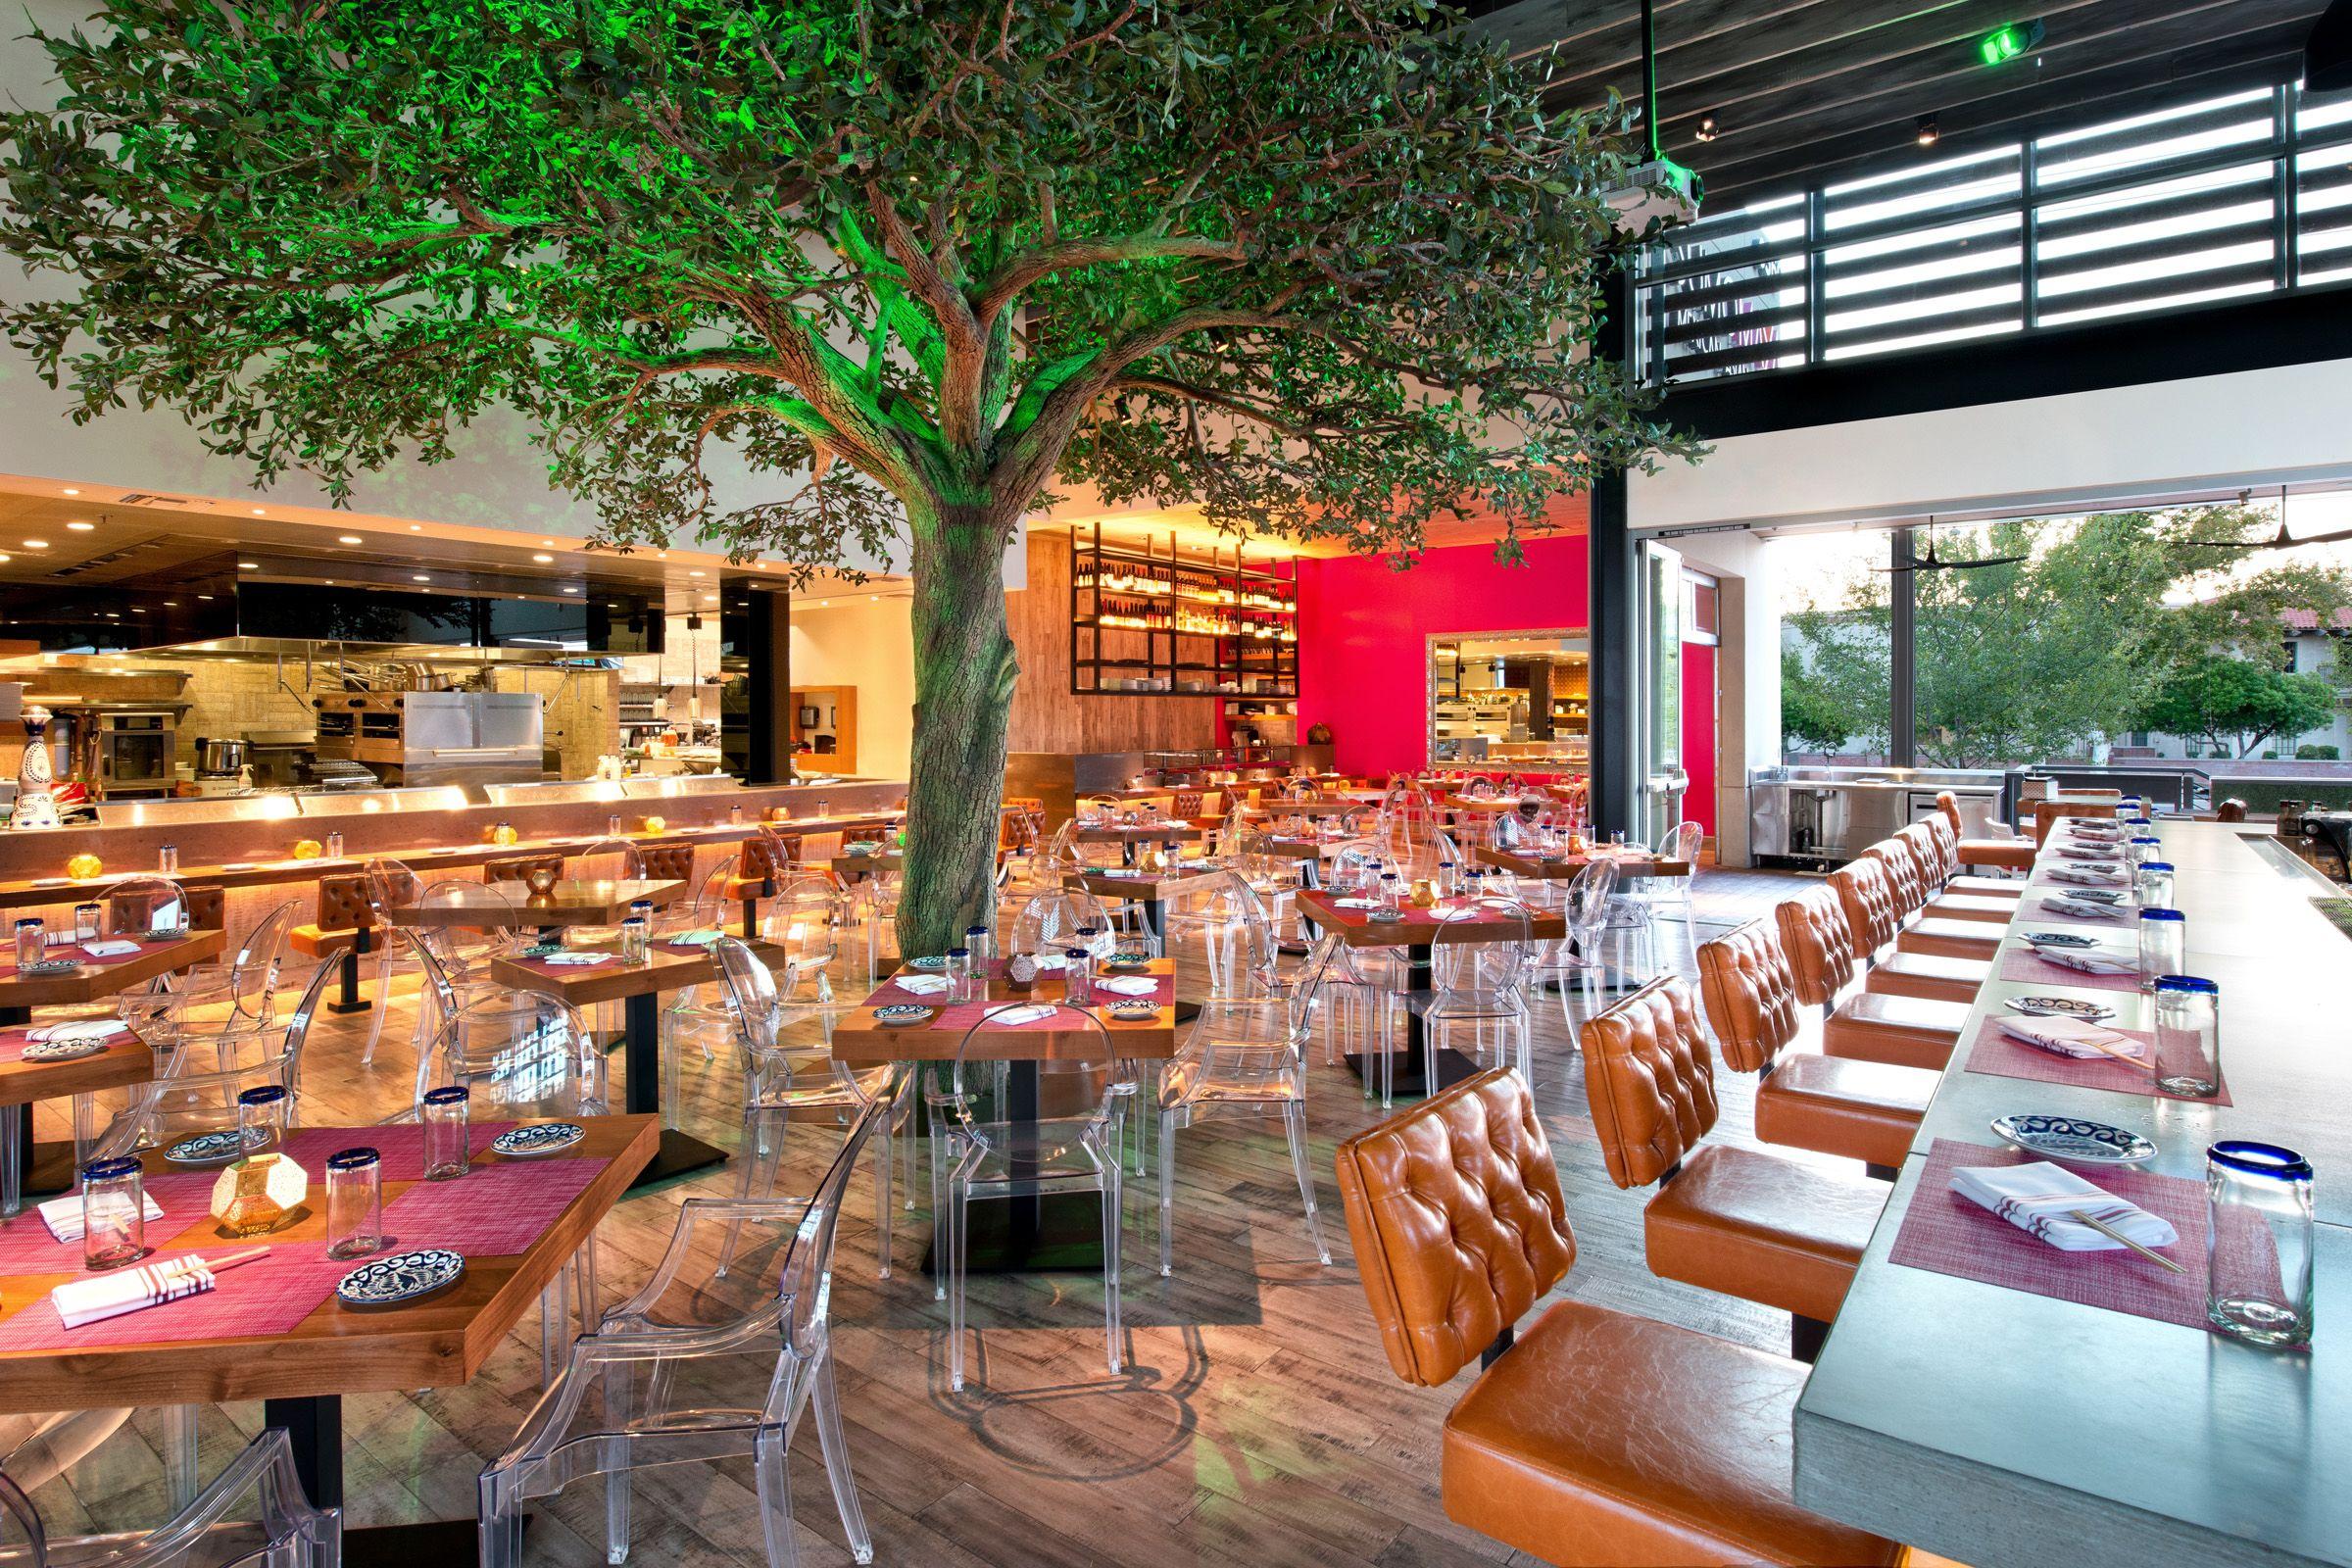 Phoenix Architecture | Restaurant architecture, Residential architecture, Architecture design